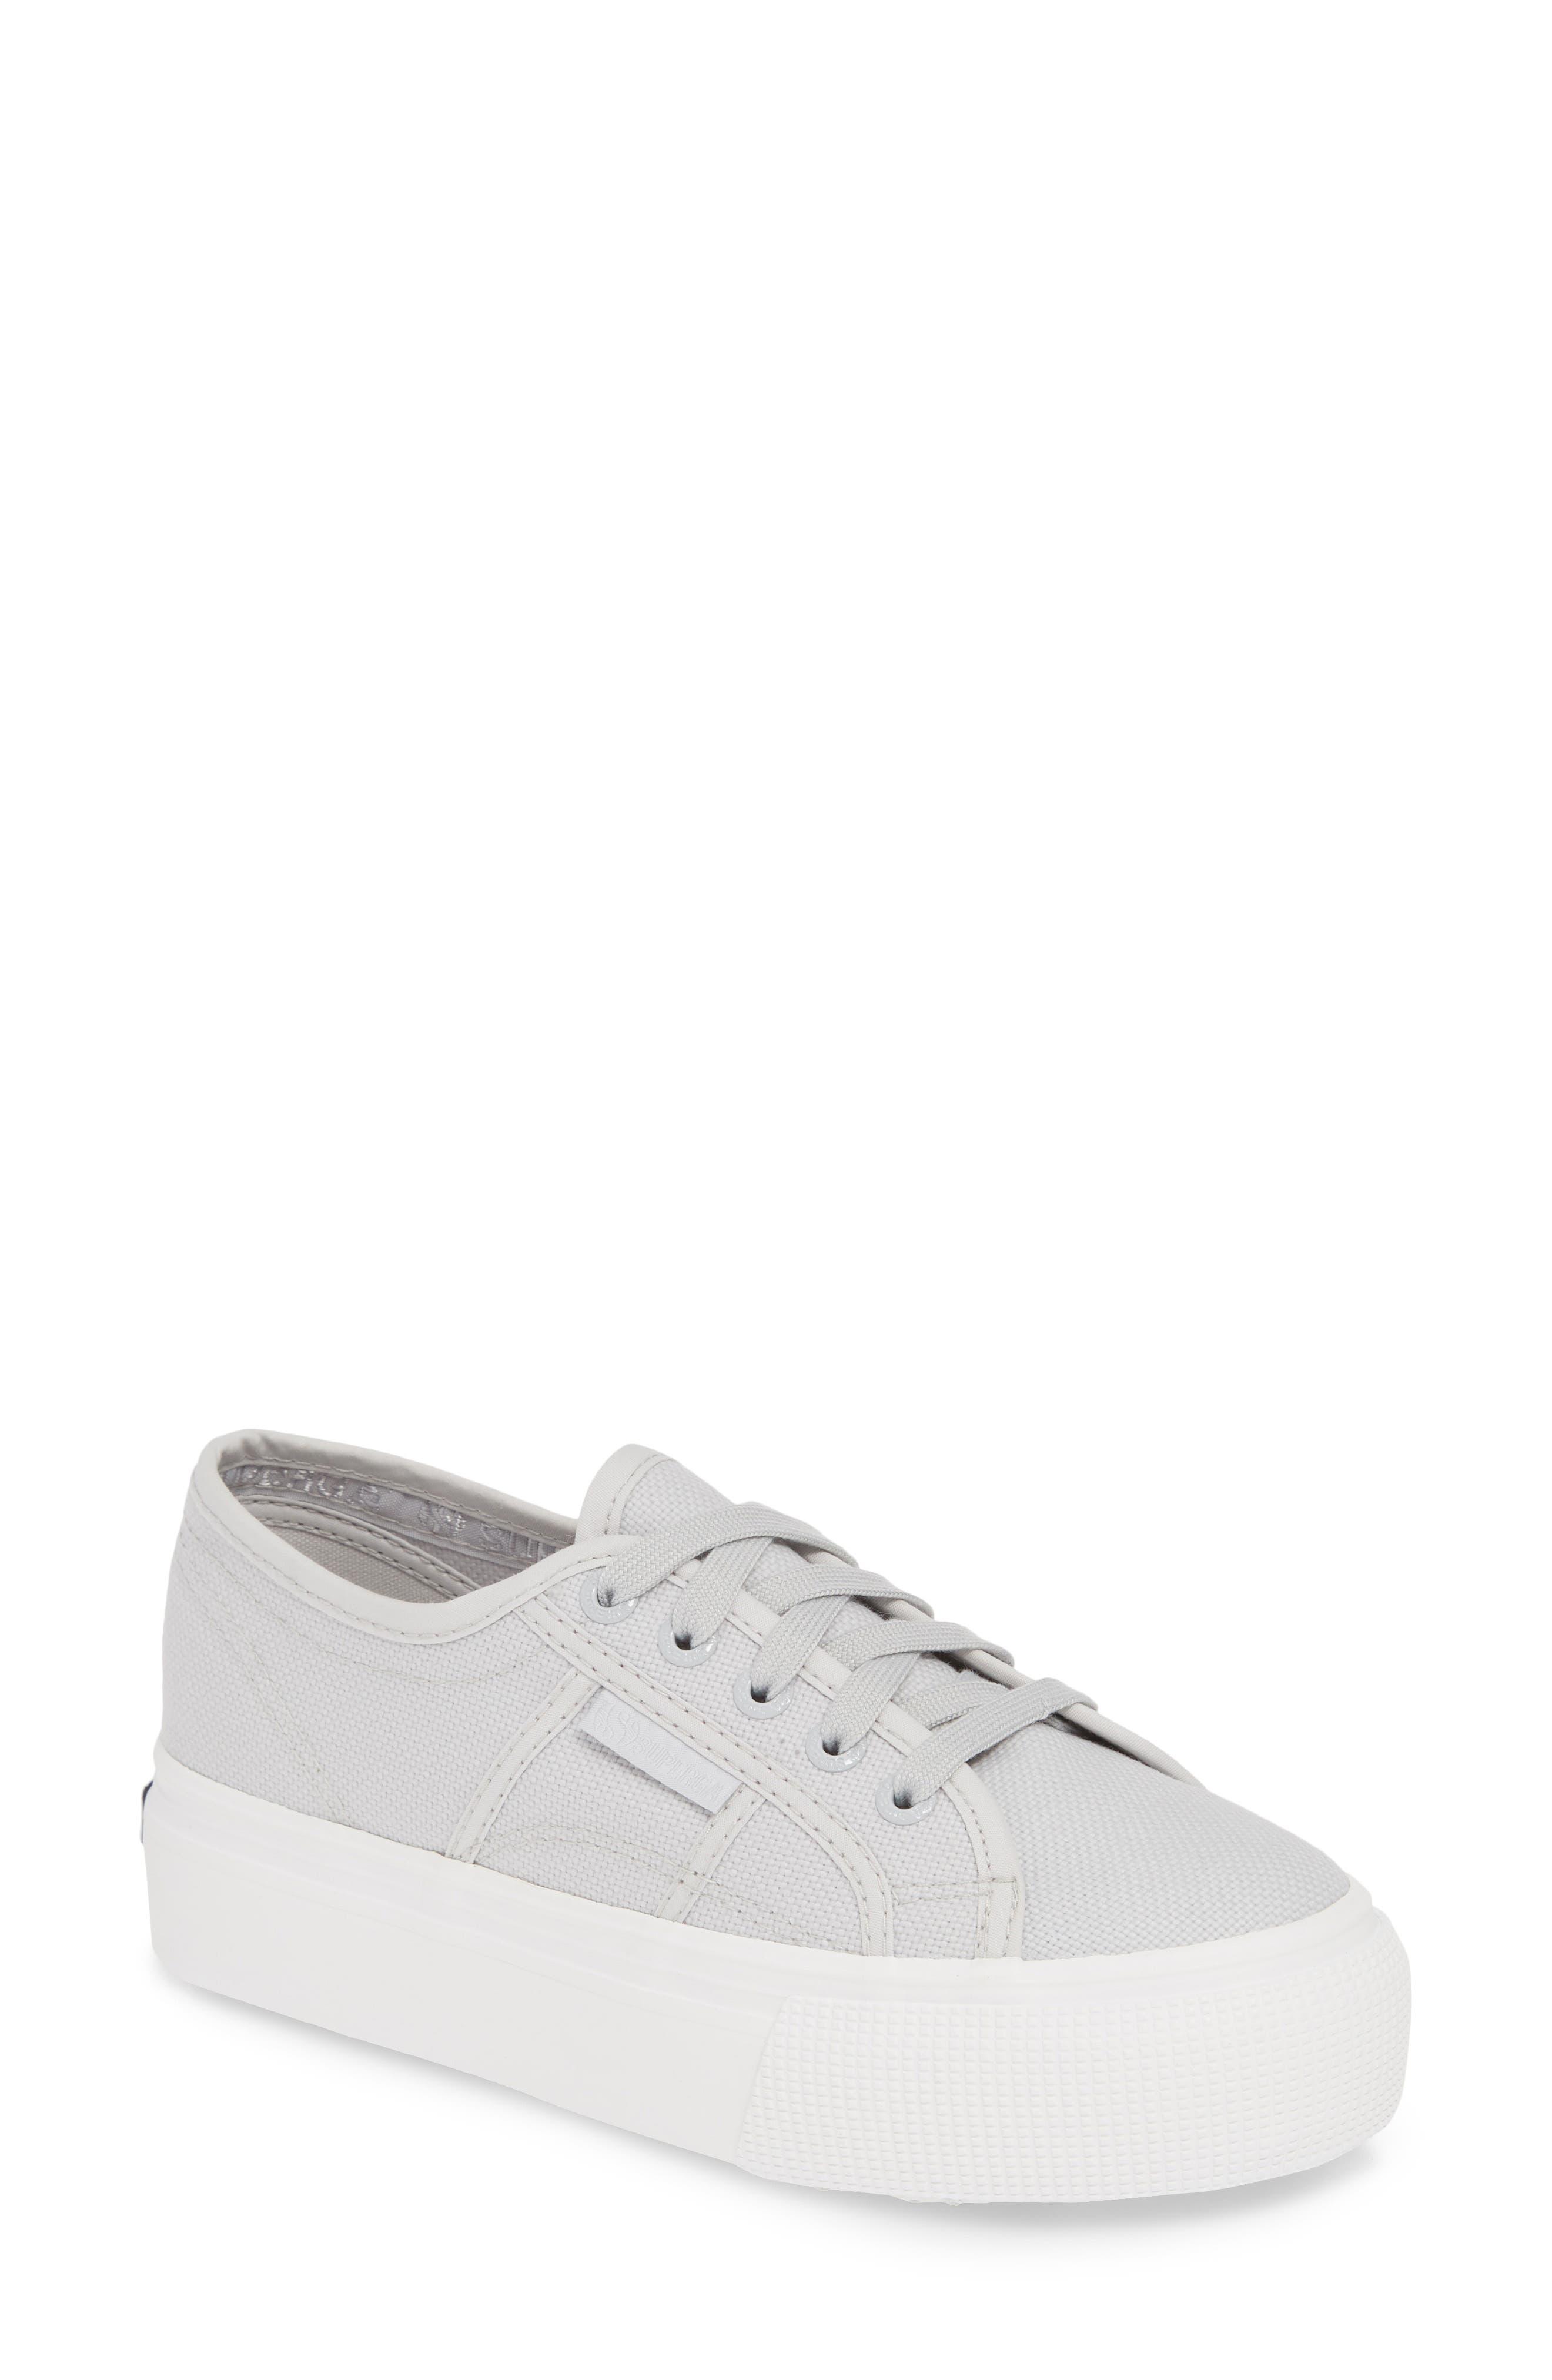 53356e00afbabd Women s Platform Shoes